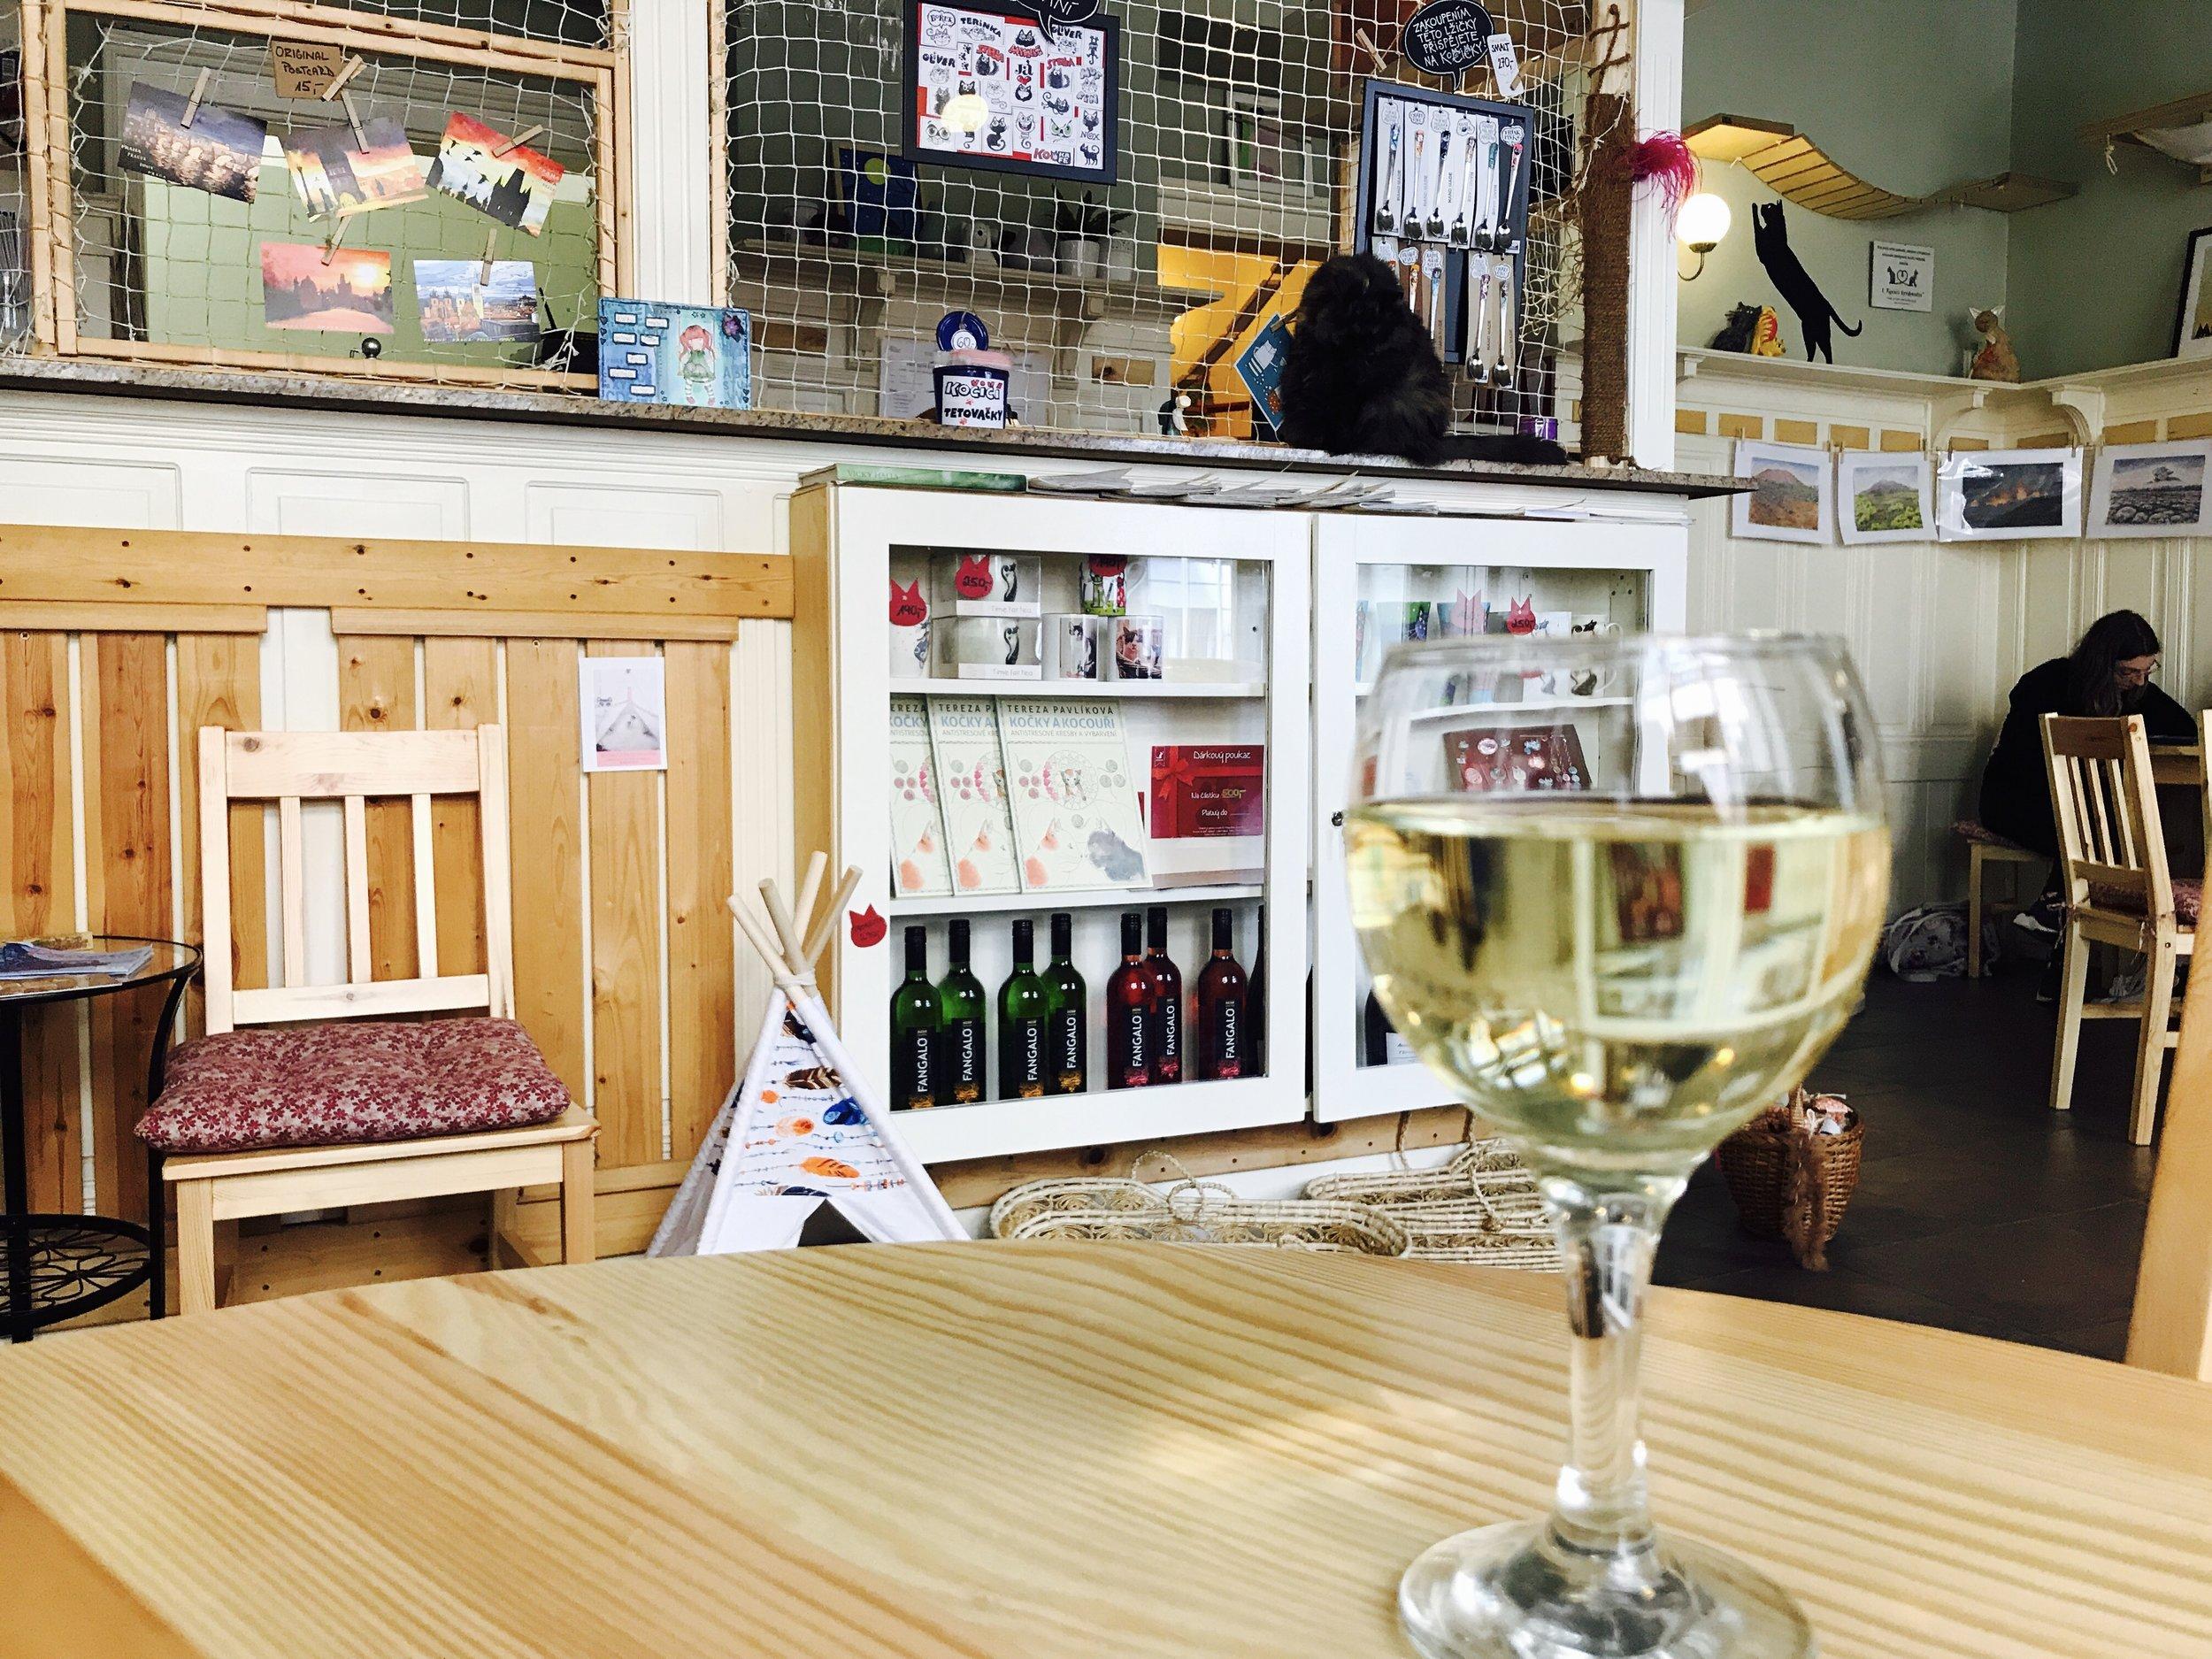 Kockafe Freya has a wide selection of beer, wine, juice, coffee and snacks